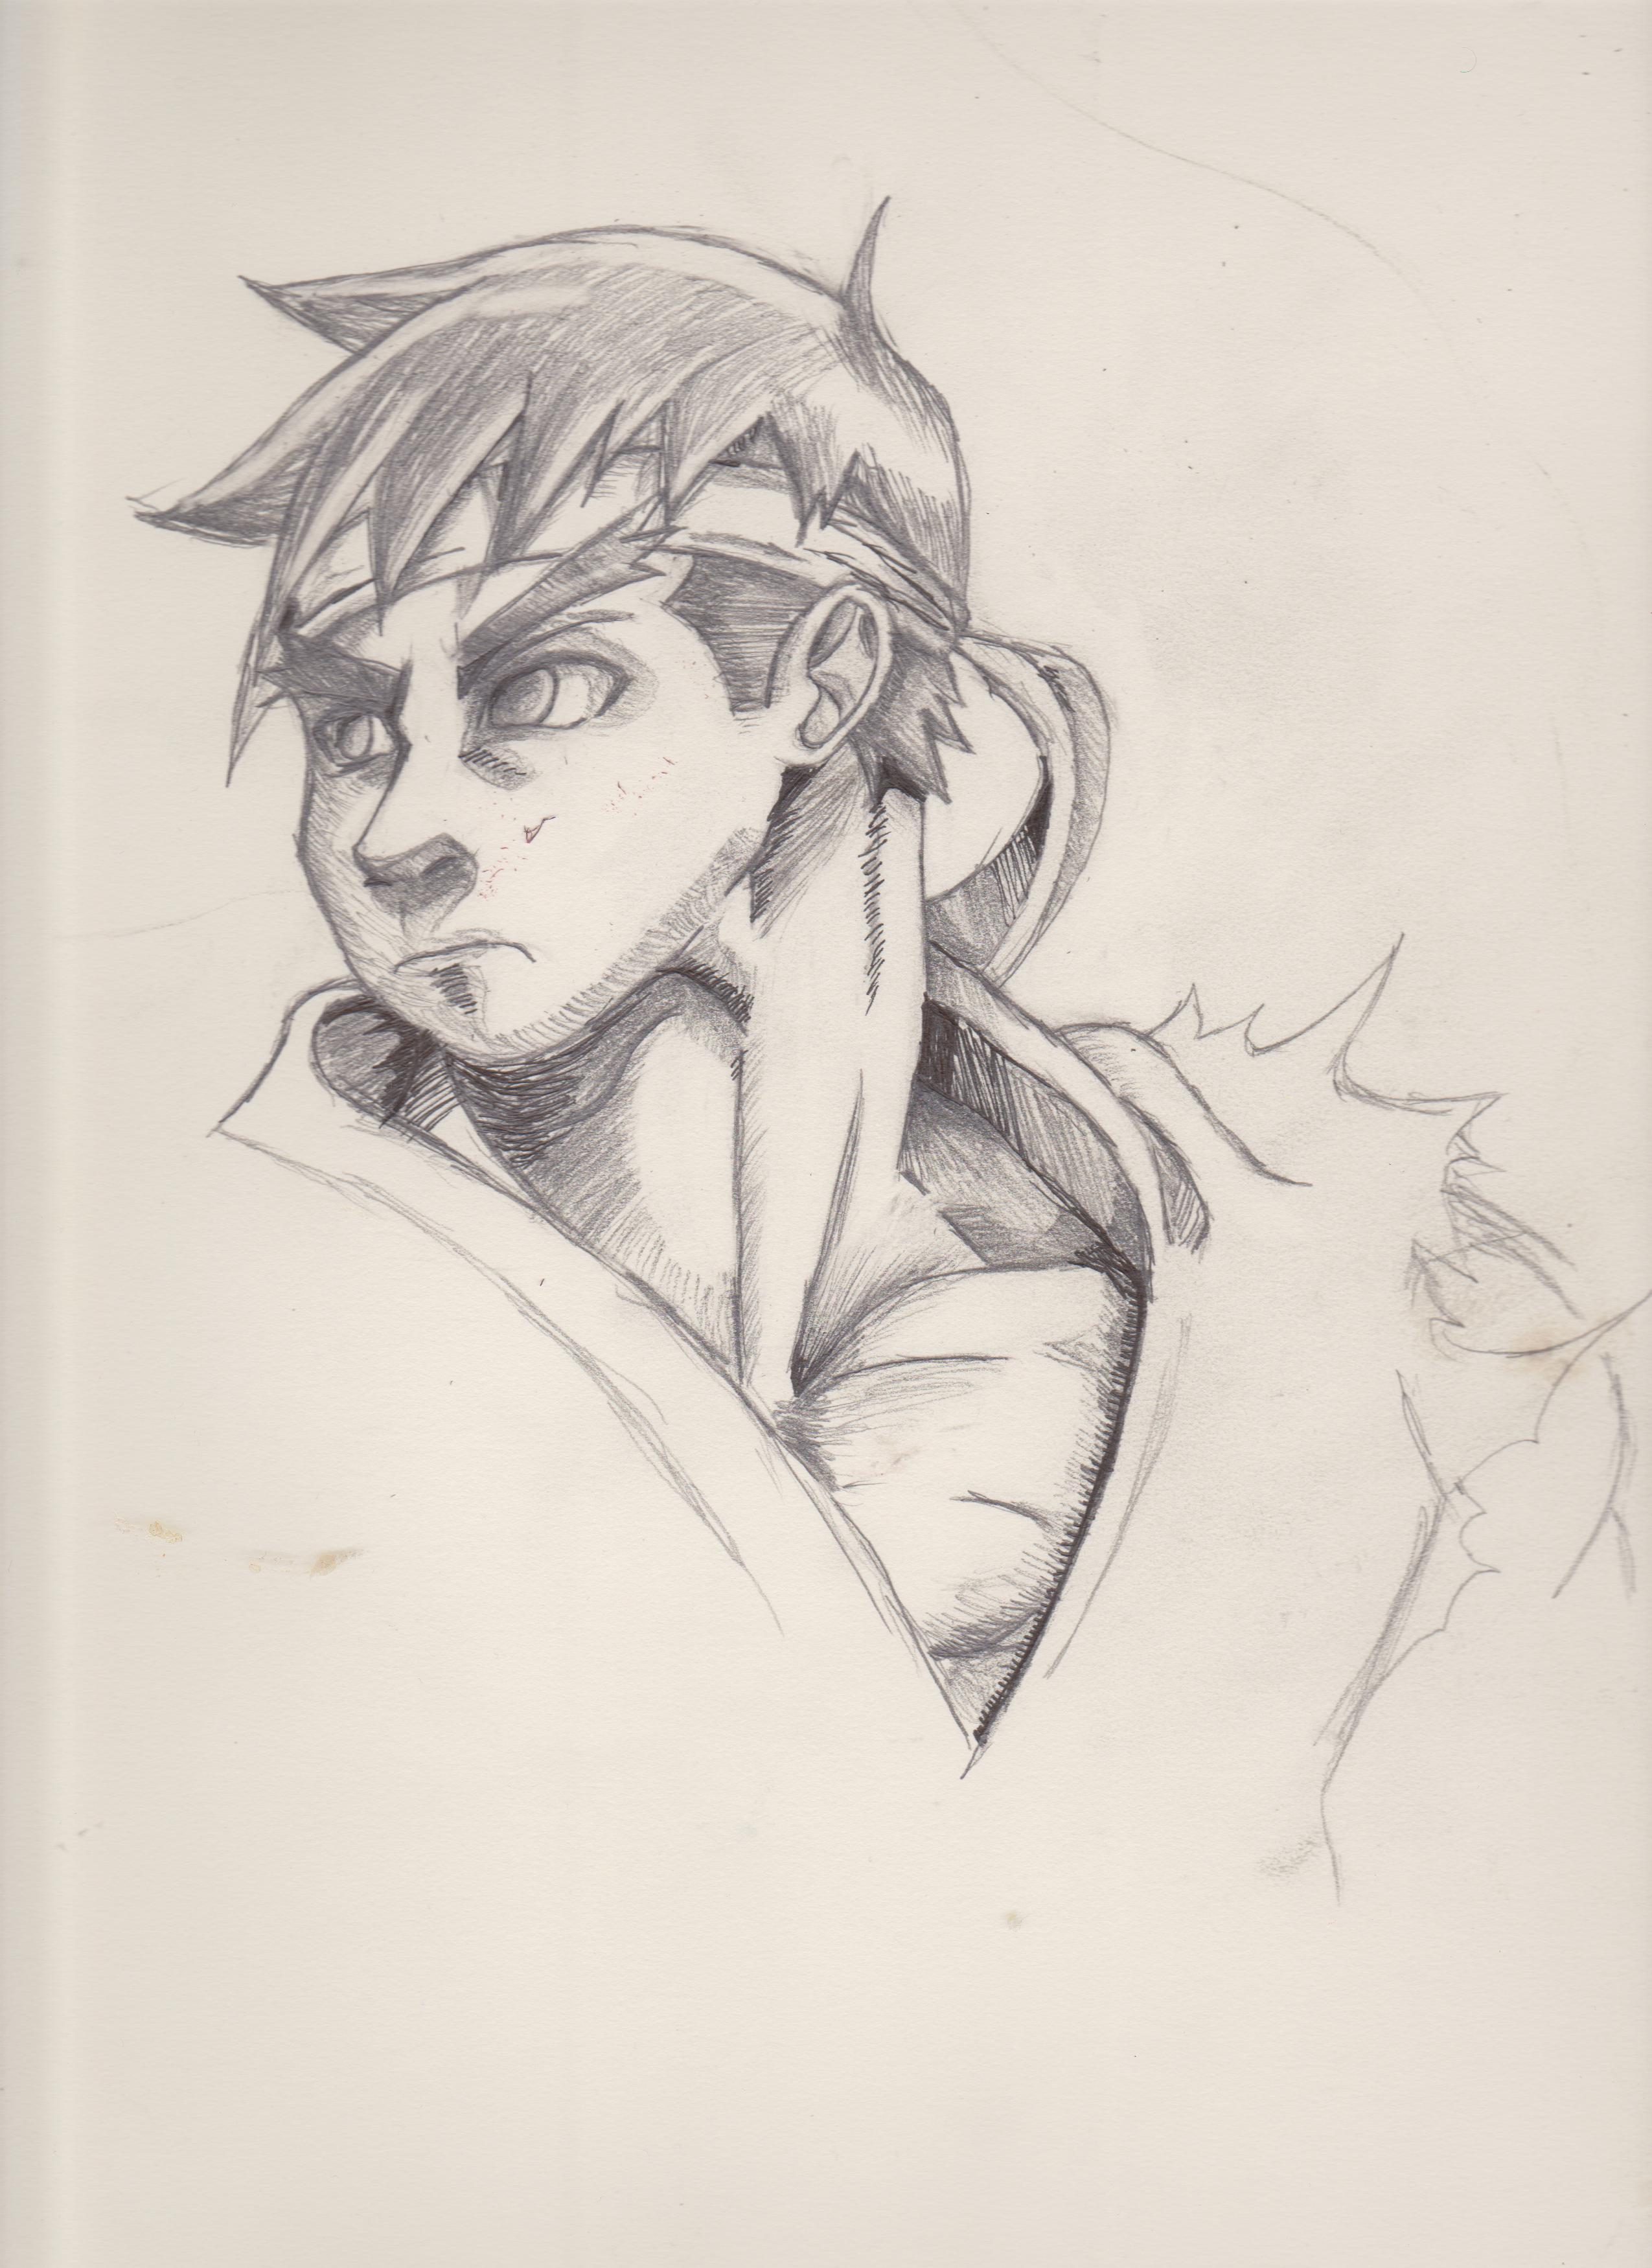 Street Fighter Alpha Ryu